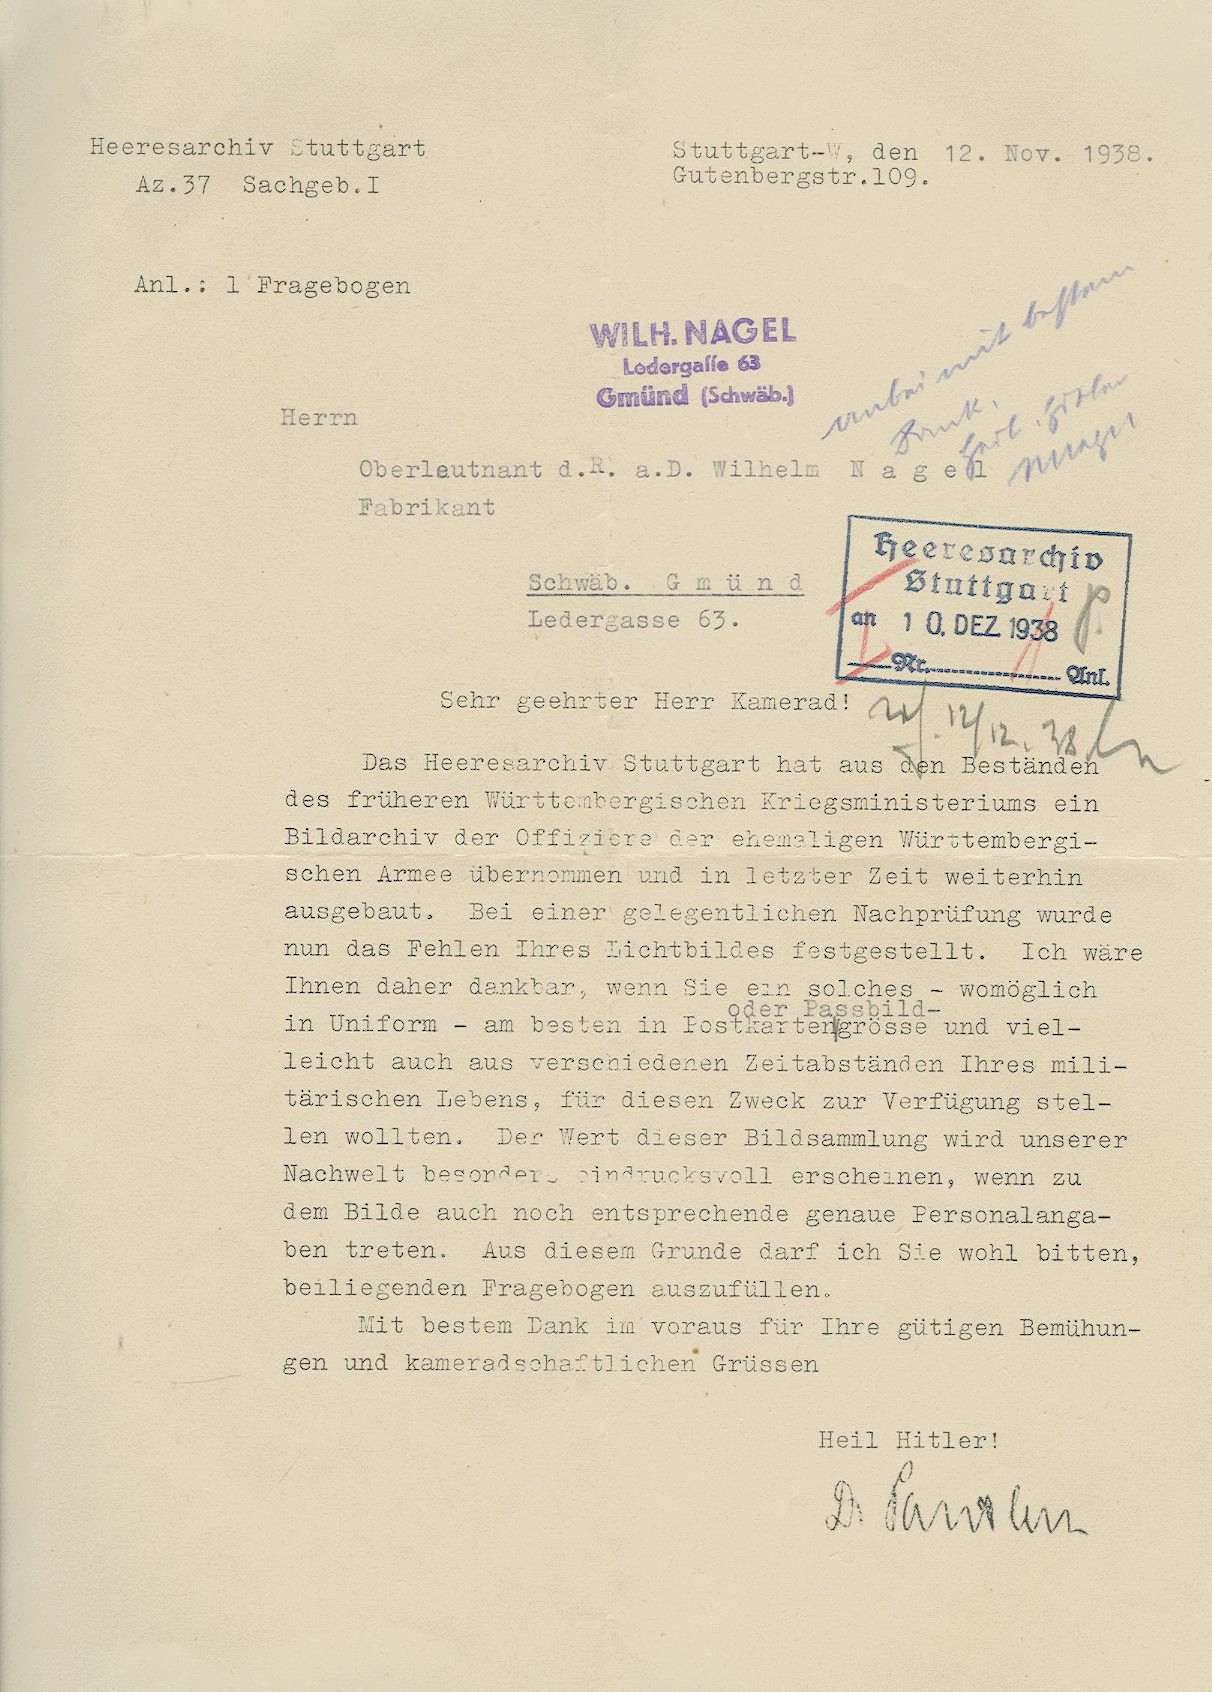 Nagel, Wilhelm, Bild 3